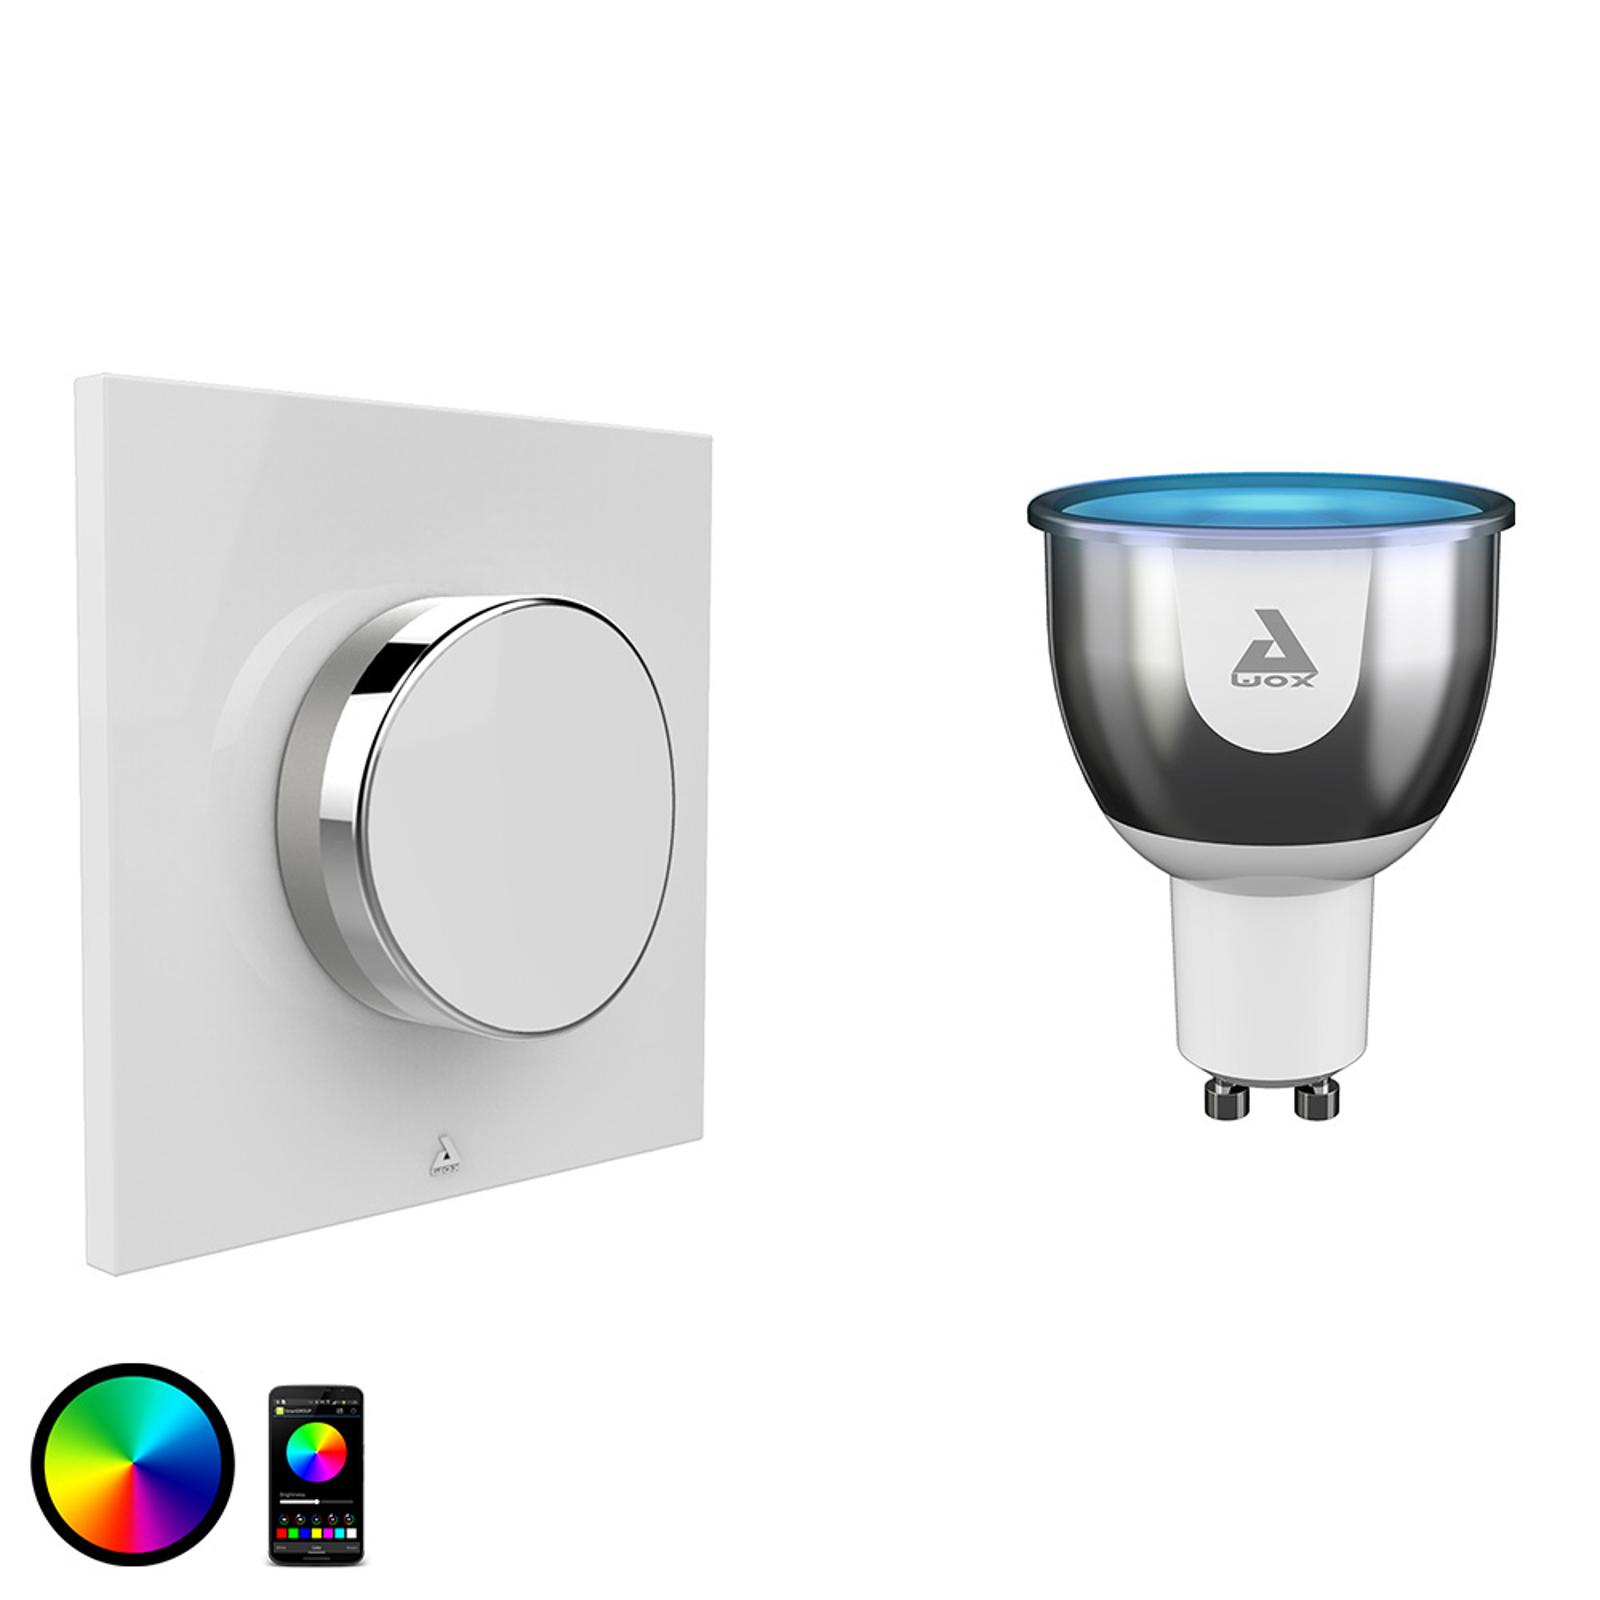 AwoX SmartLIGHT Color LED-pære GU10 + SmartPEPPLE